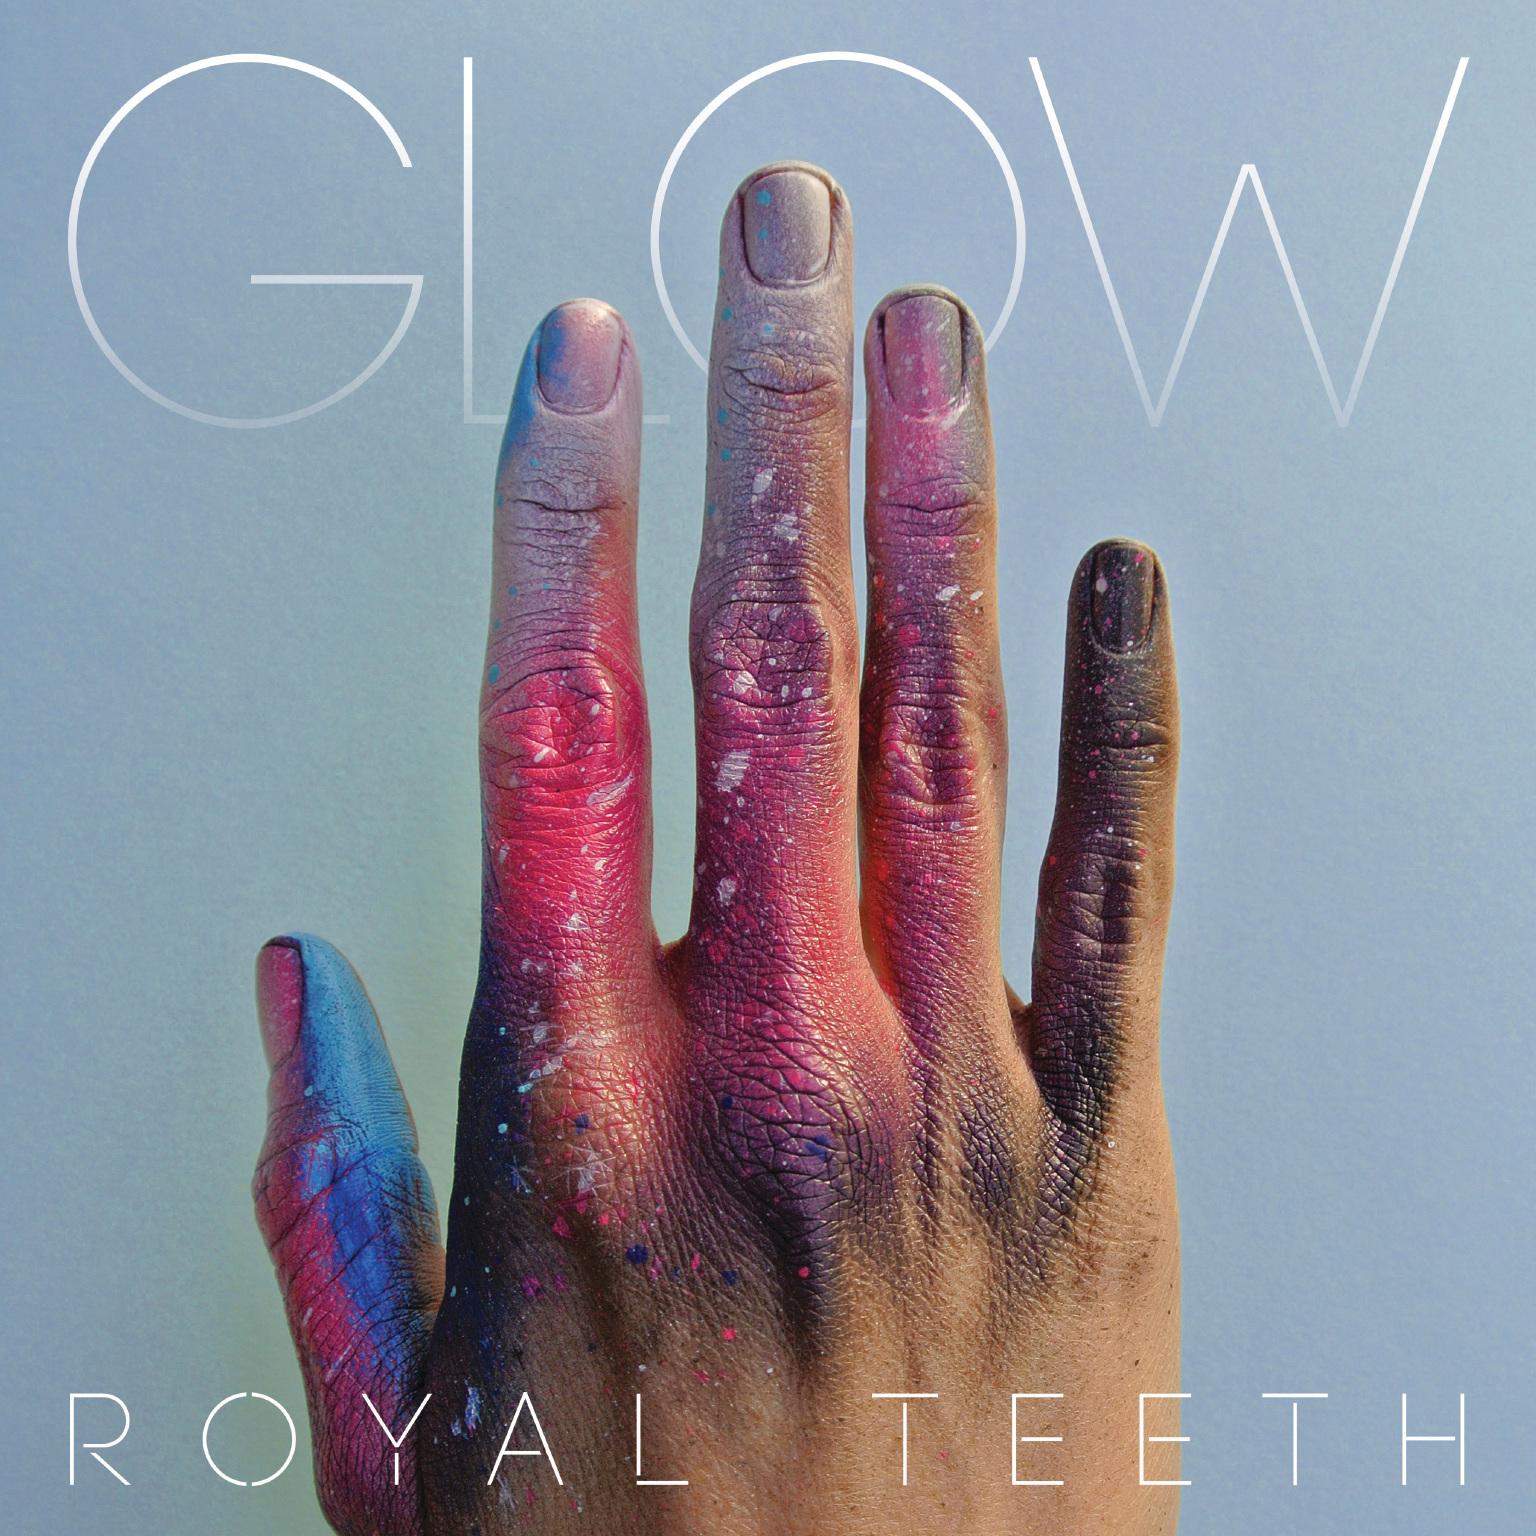 Royal Teeth - Glow - Digital